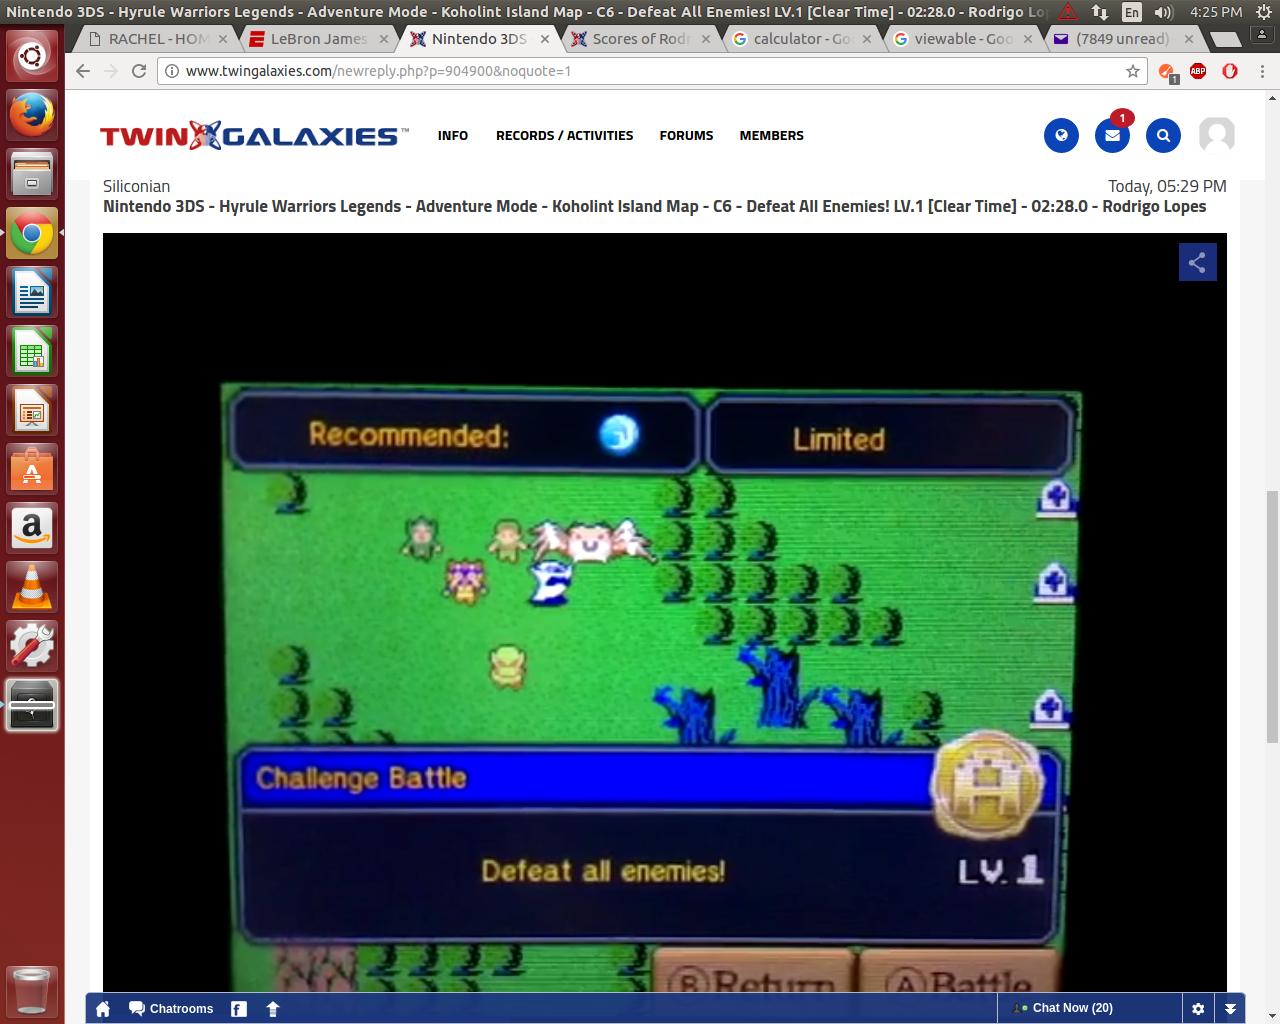 Nintendo 3DS - Hyrule Warriors Legends - Adventure Mode - Koholint